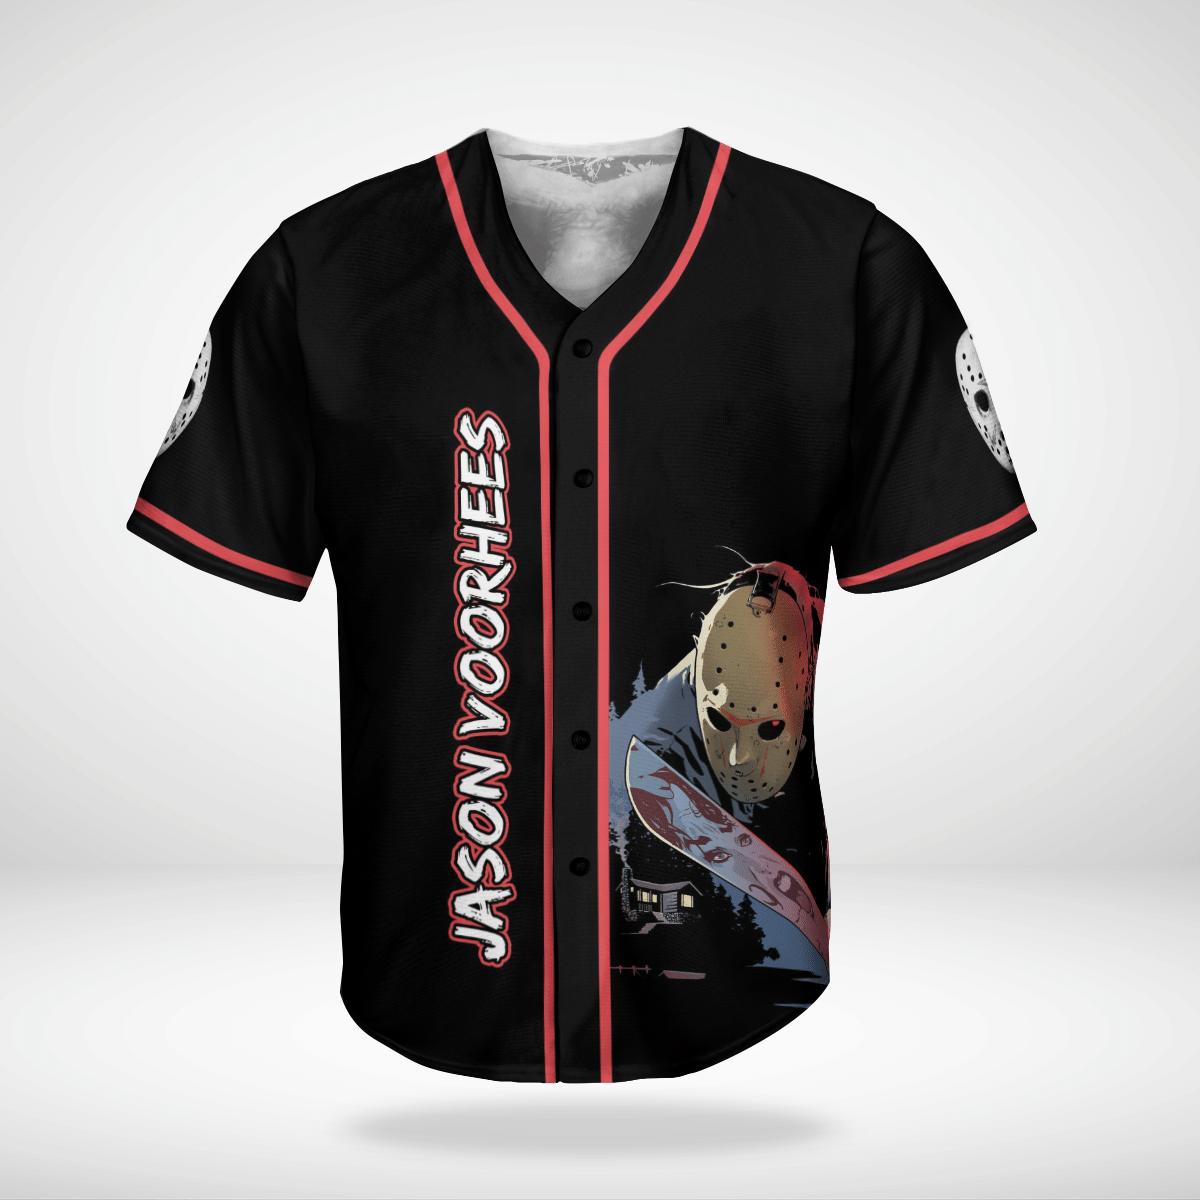 Jason Voorhees Halloween killer Jersey Shirt